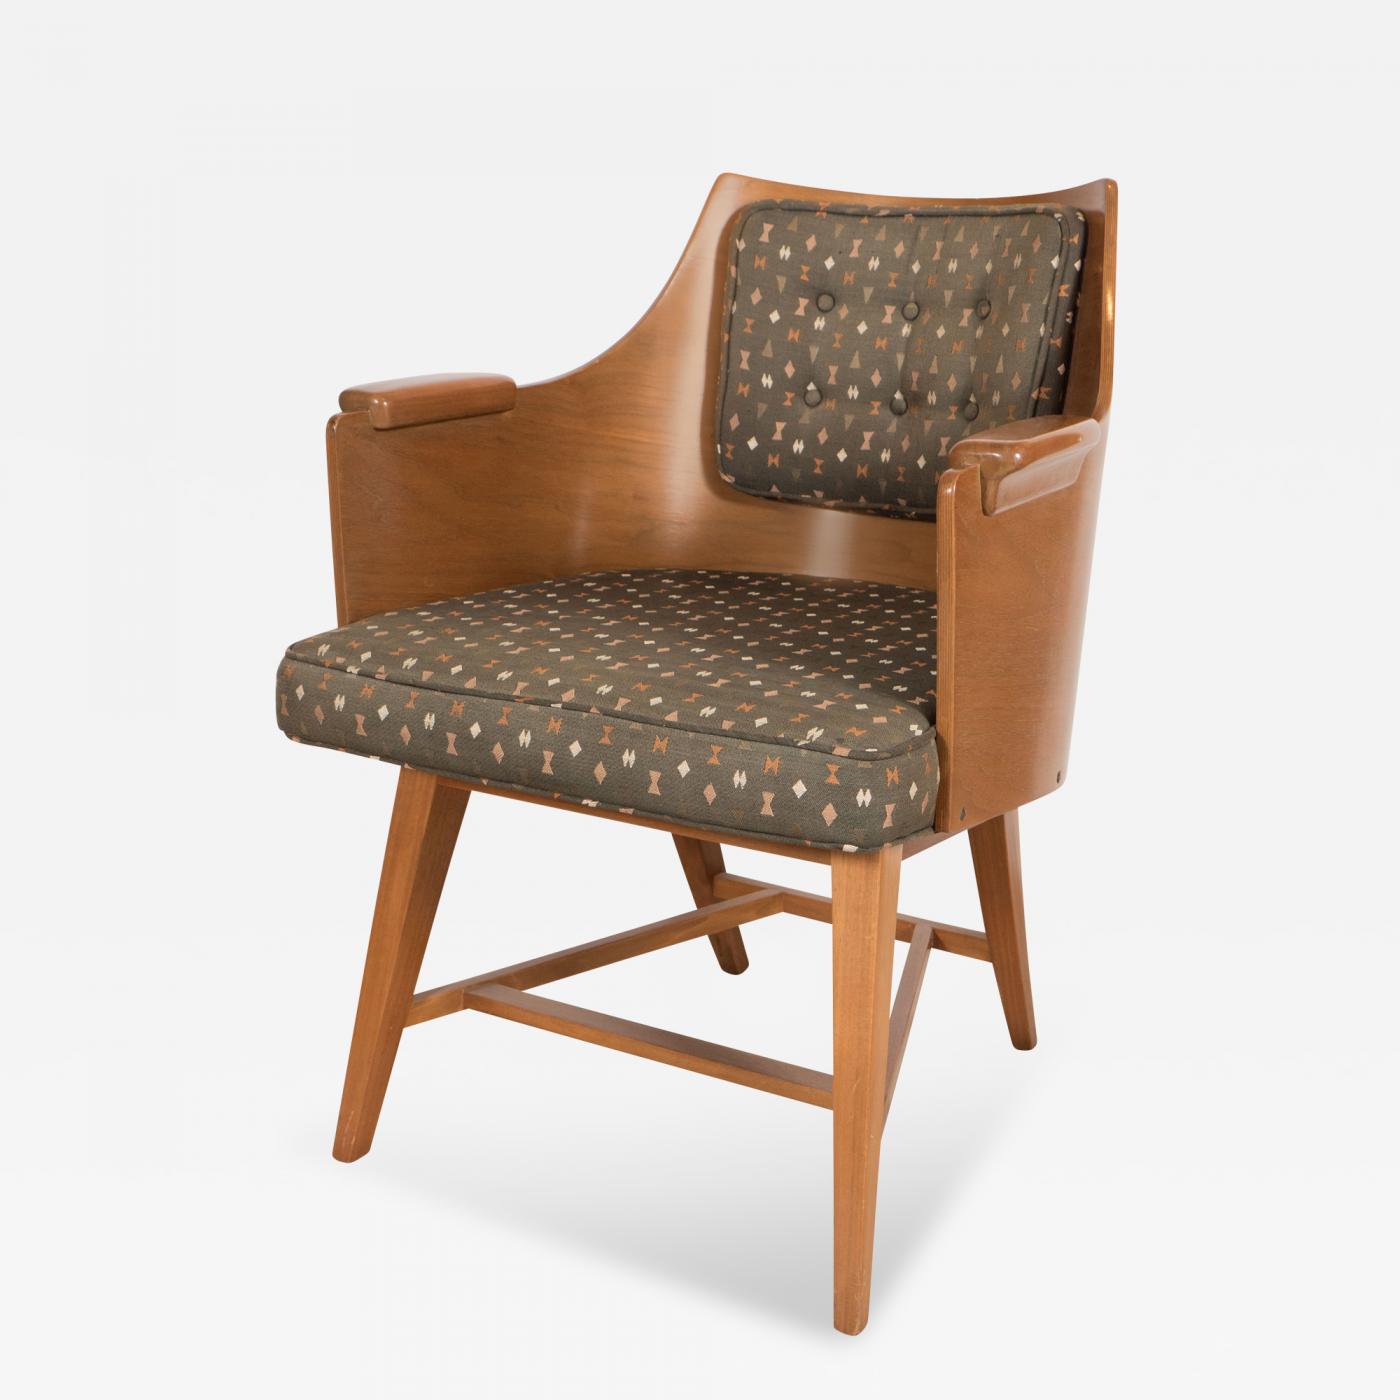 Edward wormley rare dunbar chair by wormley - Edward wormley chairs ...